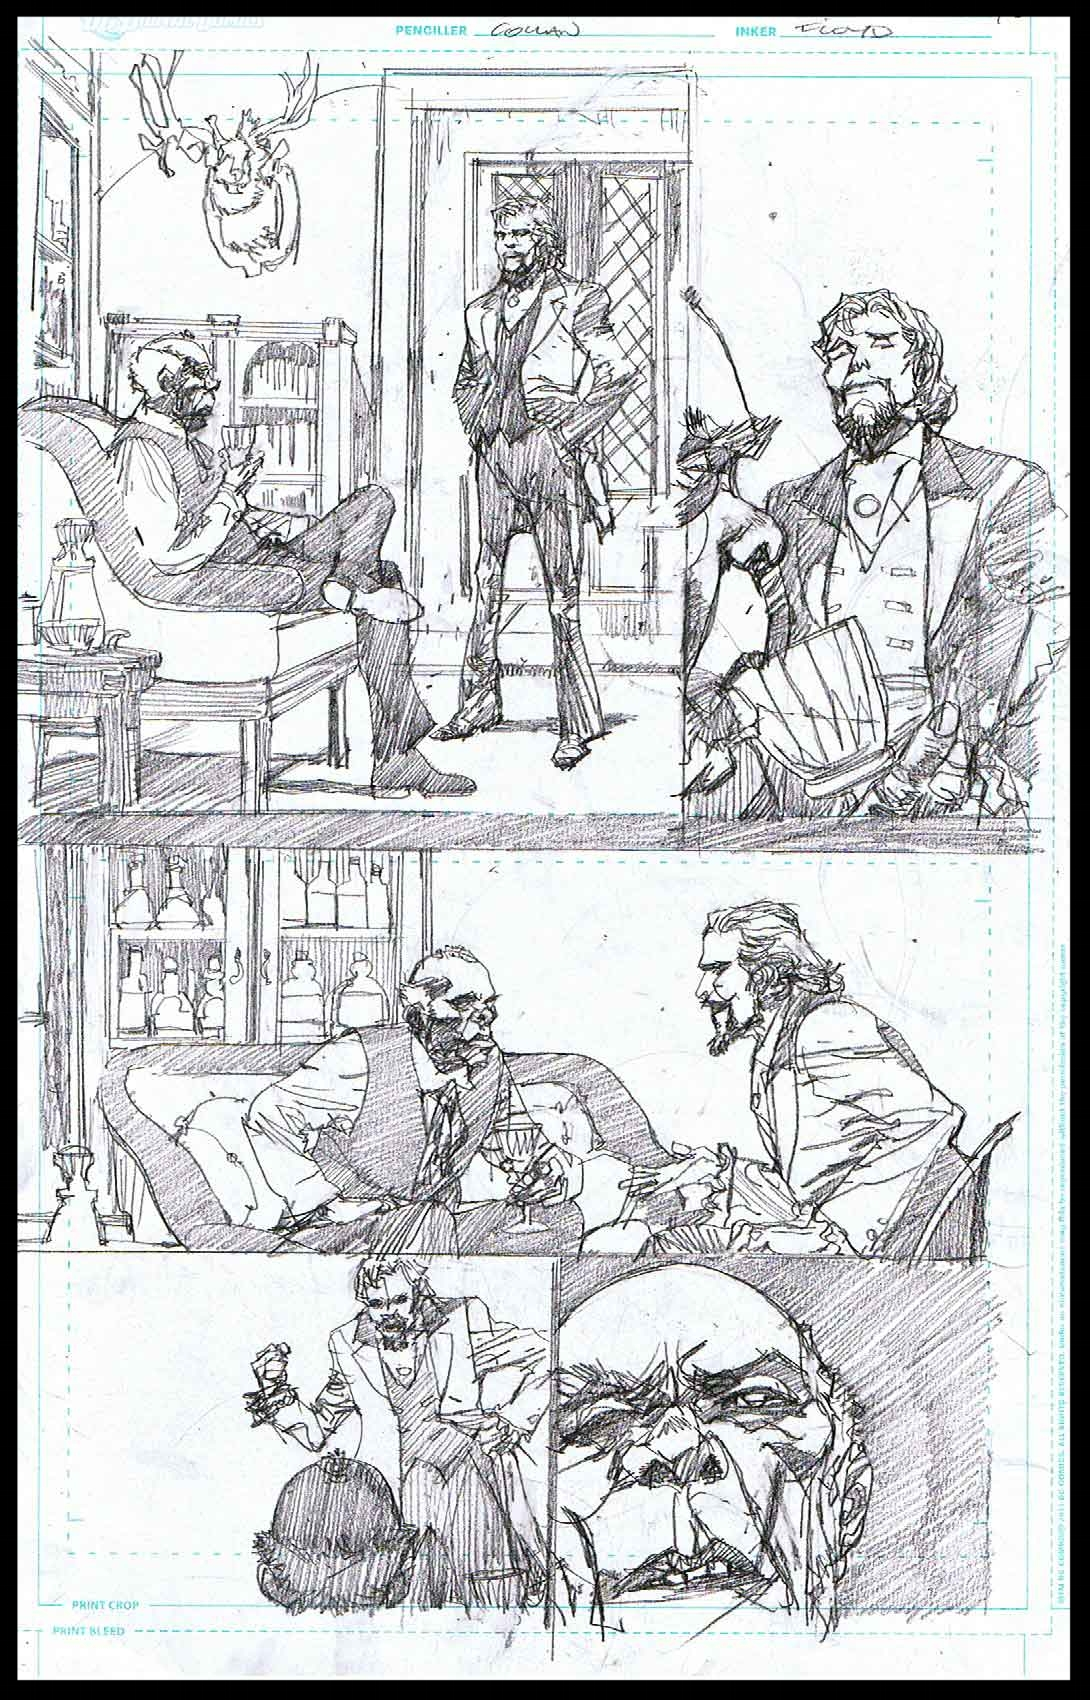 Django Unchained #6 - Page 3 - Pencils